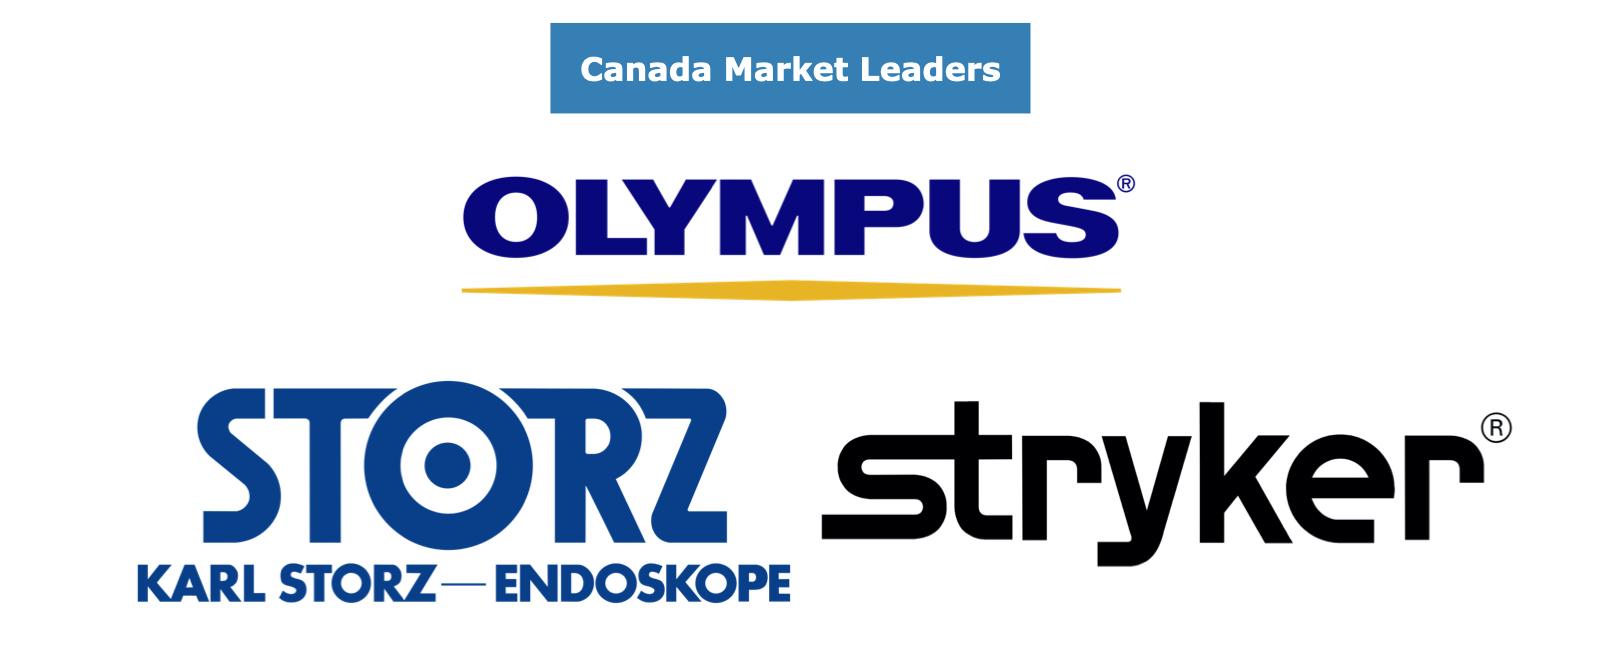 Canada Endoscope Market Share Leaders